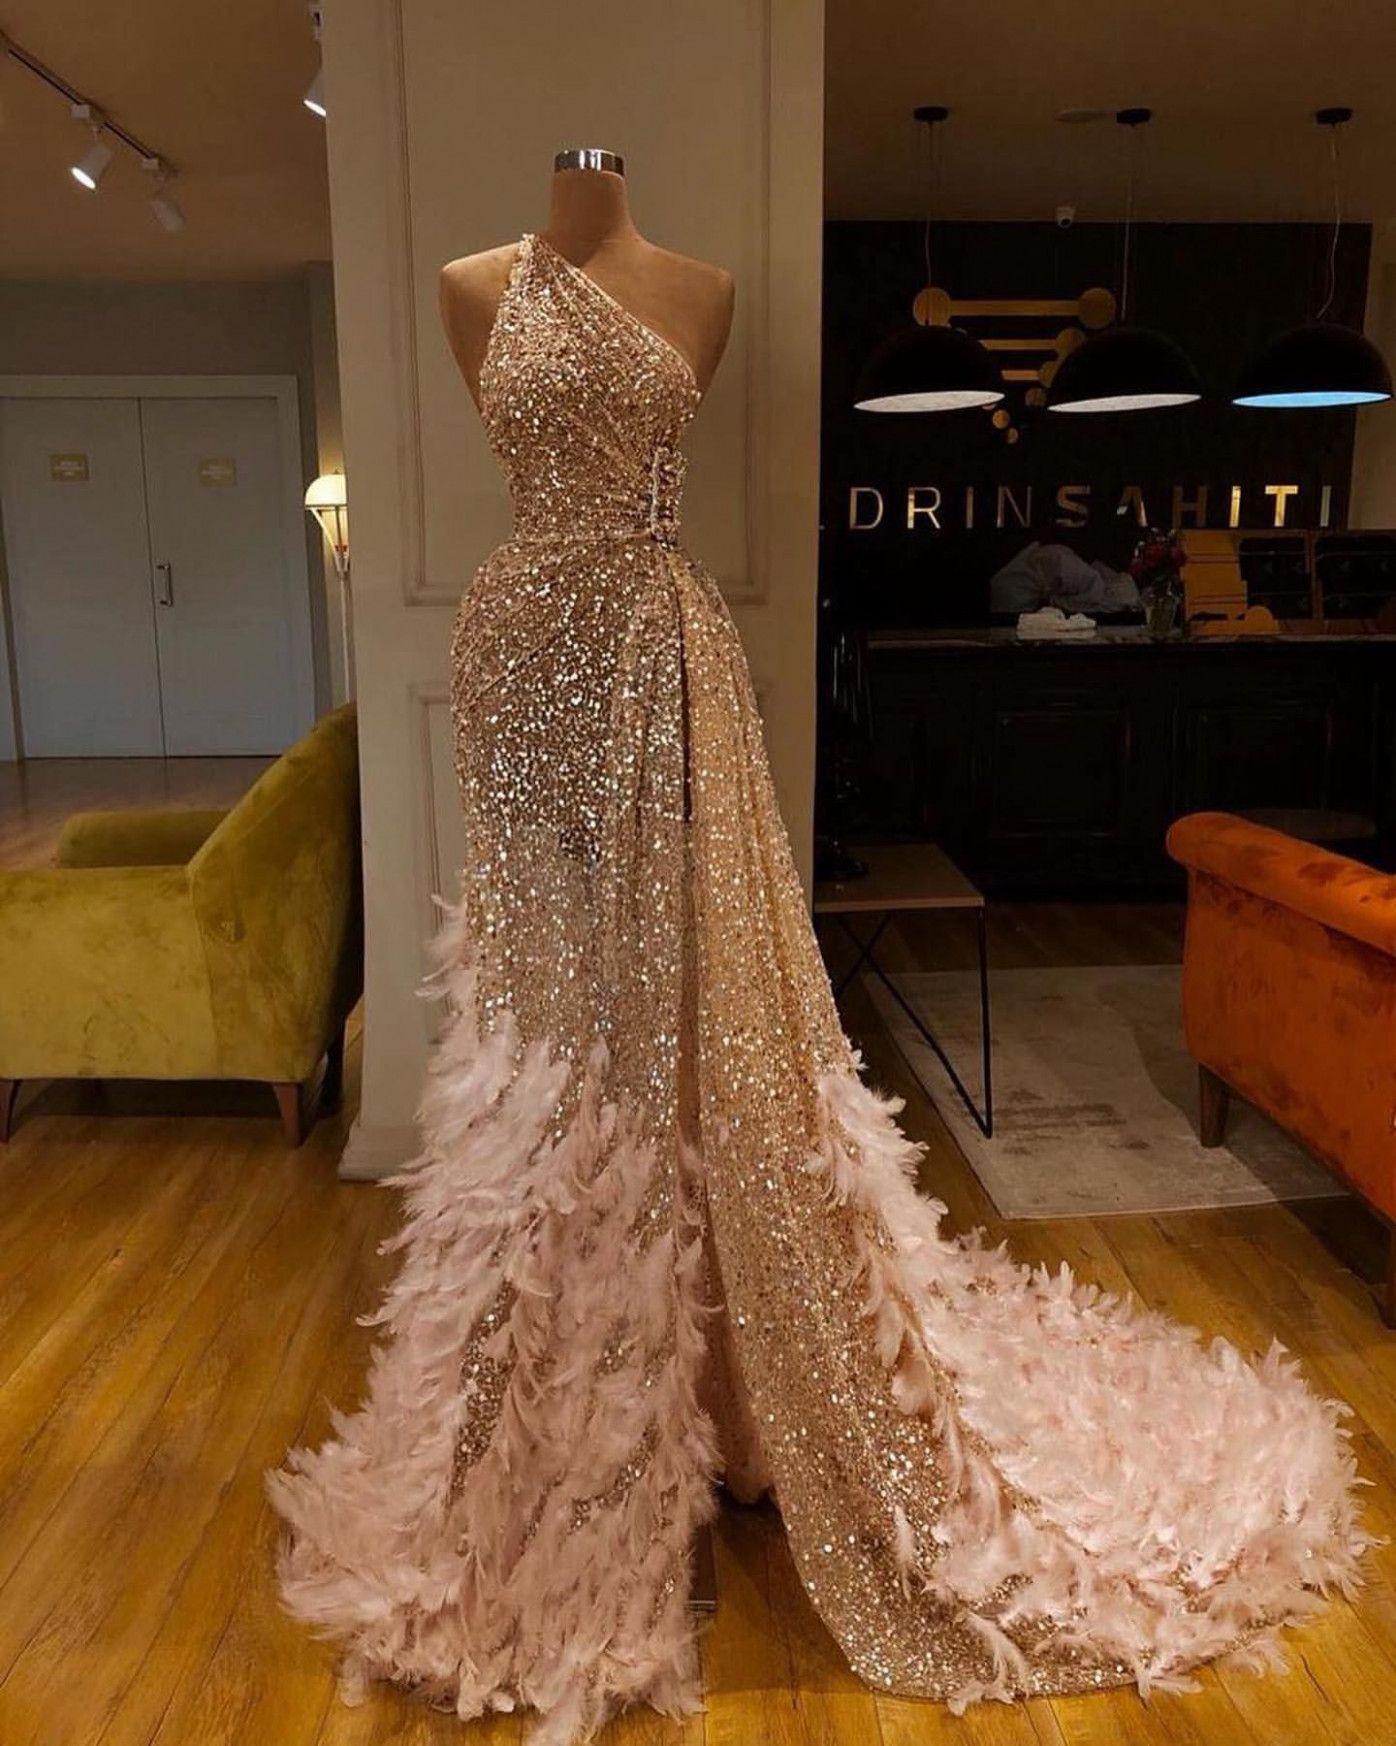 13 luxus abendkleider | abendkleid, kleider, luxus abendkleider